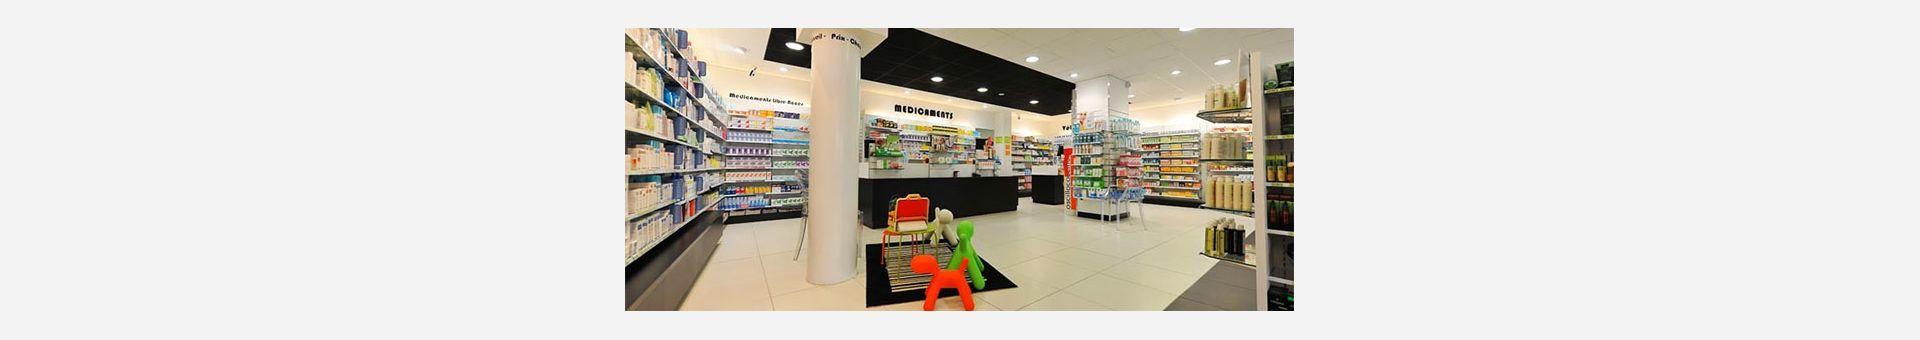 Pharmacie Belhomme Groupe Ma Pharmacie,Saint-Médard-en-Jalles